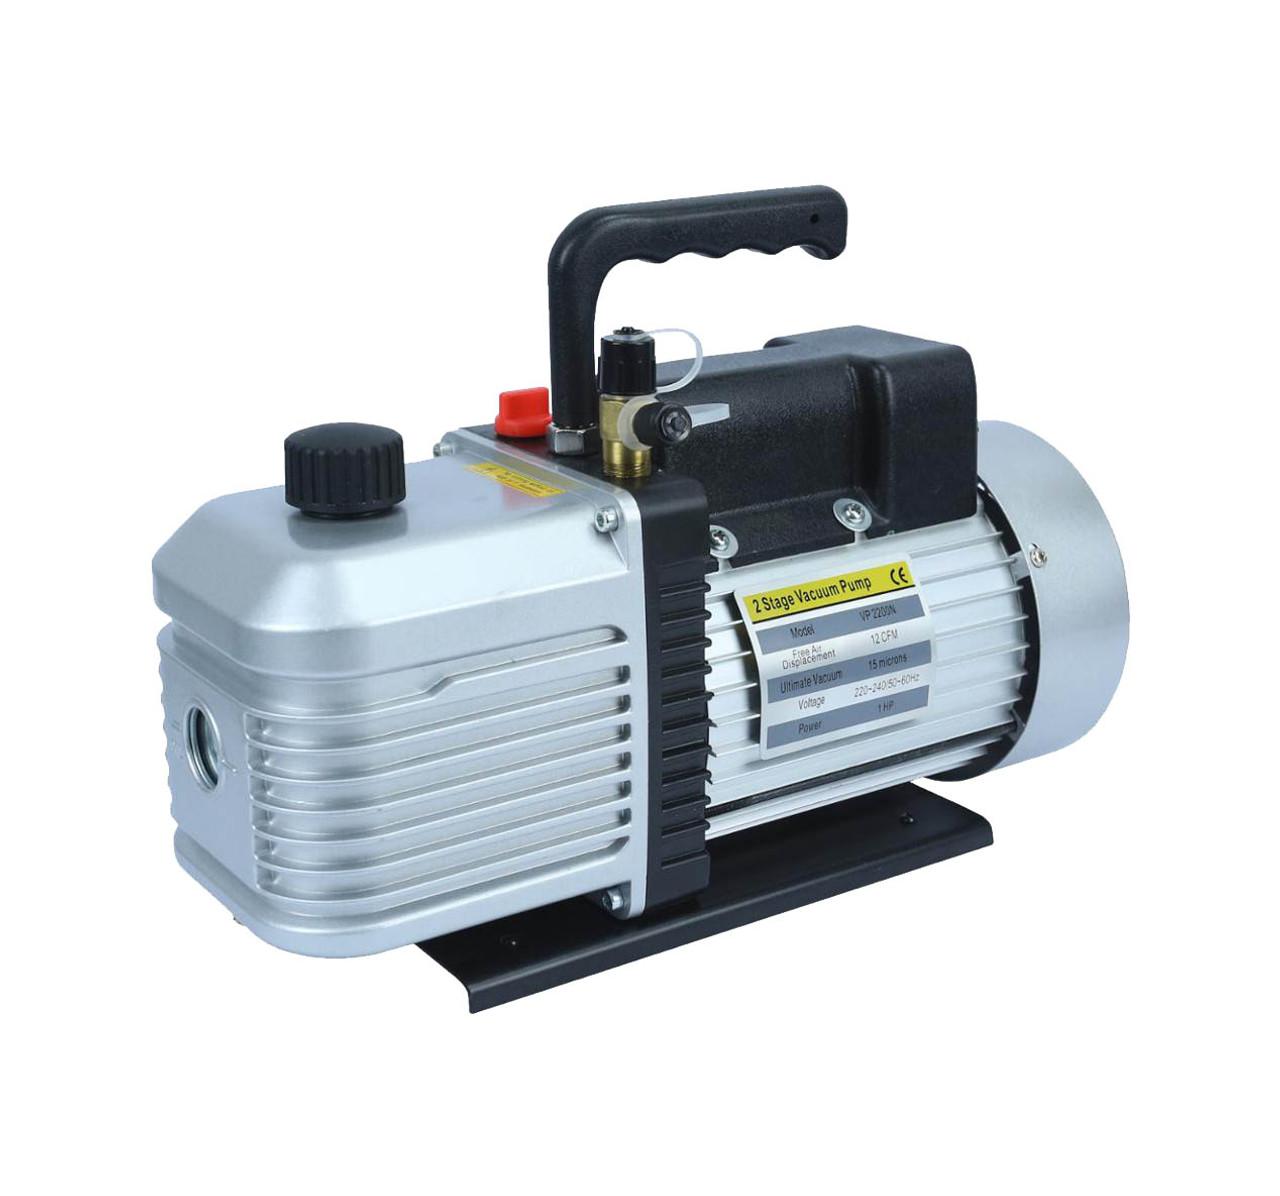 Vacuum Pump - Industrial/Commercial Refrigeration 280L/m